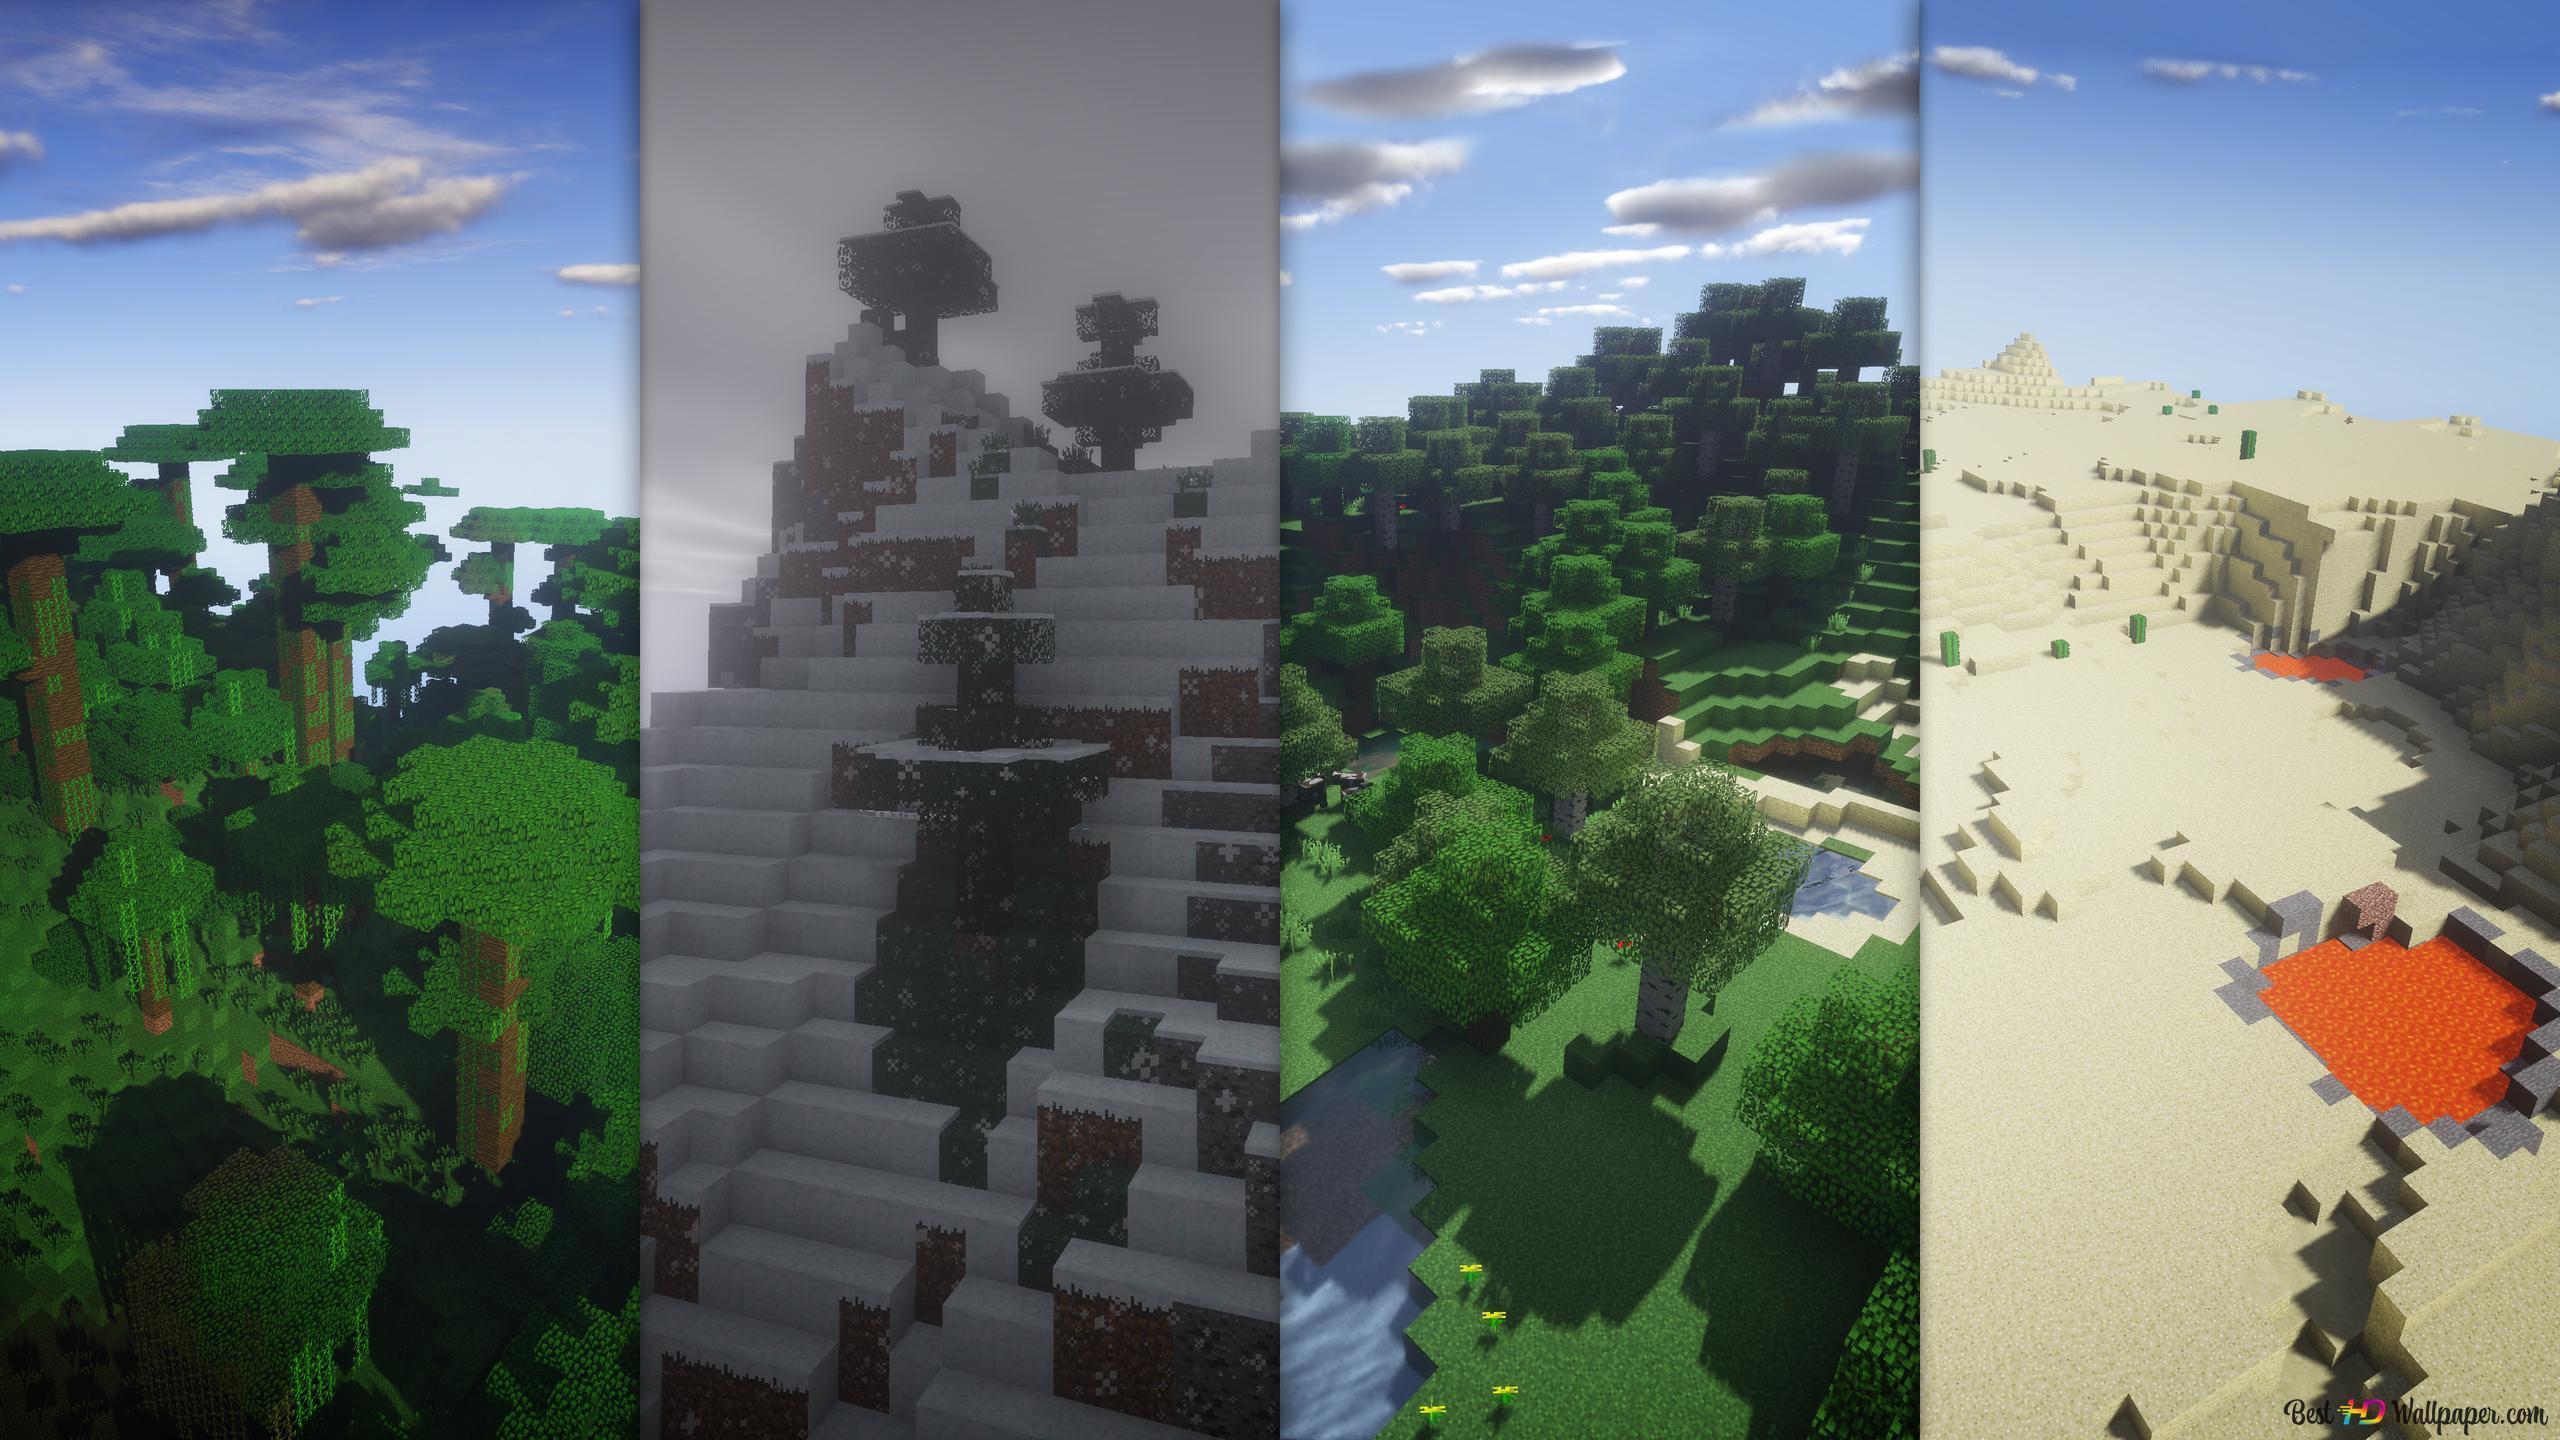 Lanskap Minecraft Unduhan Wallpaper Hd